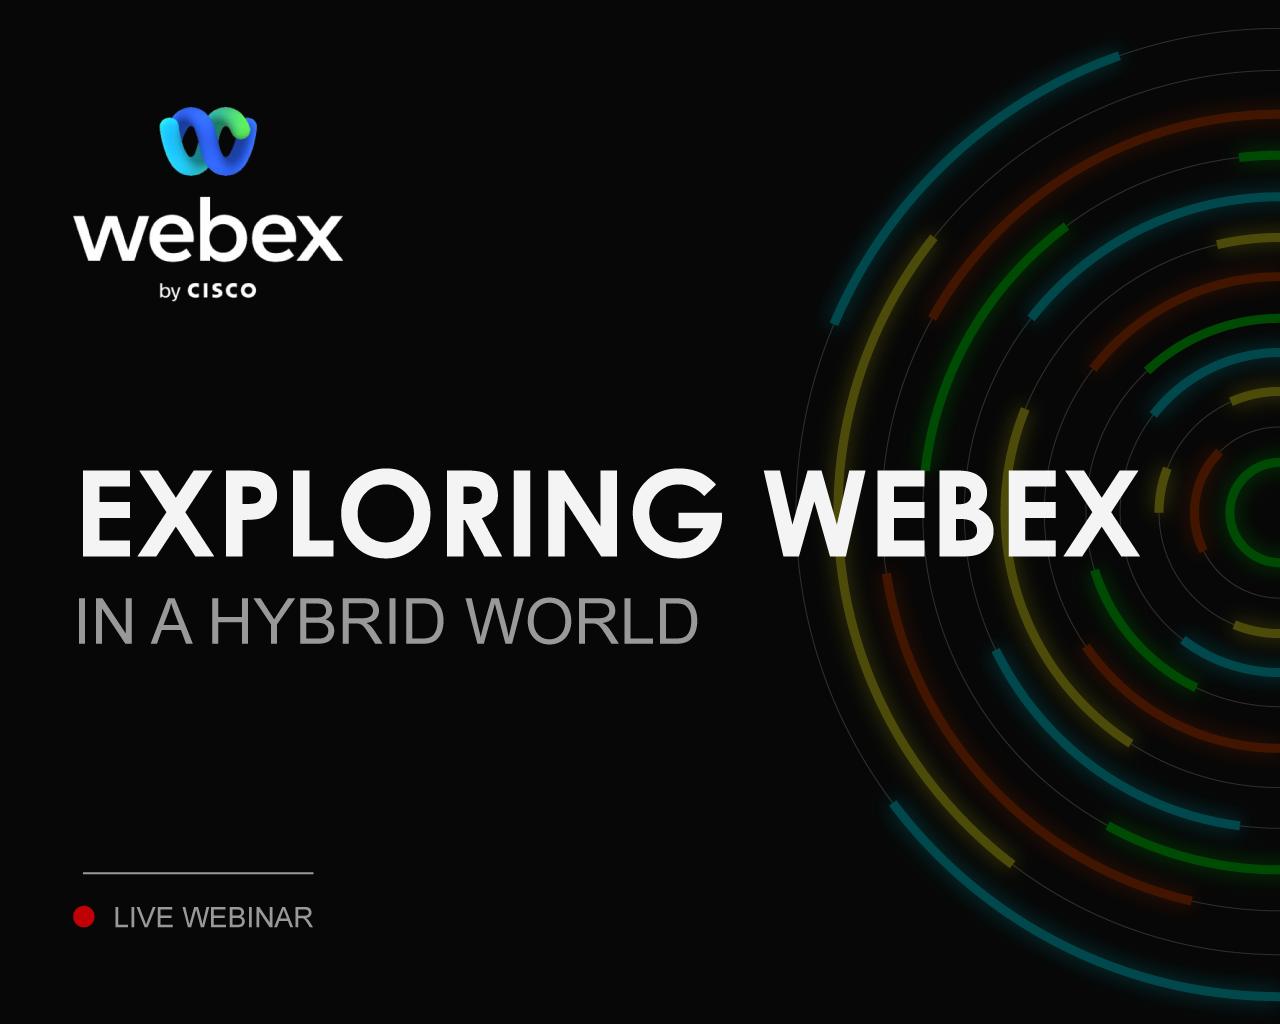 info.calltower.comhubfsExploring-Webex--3